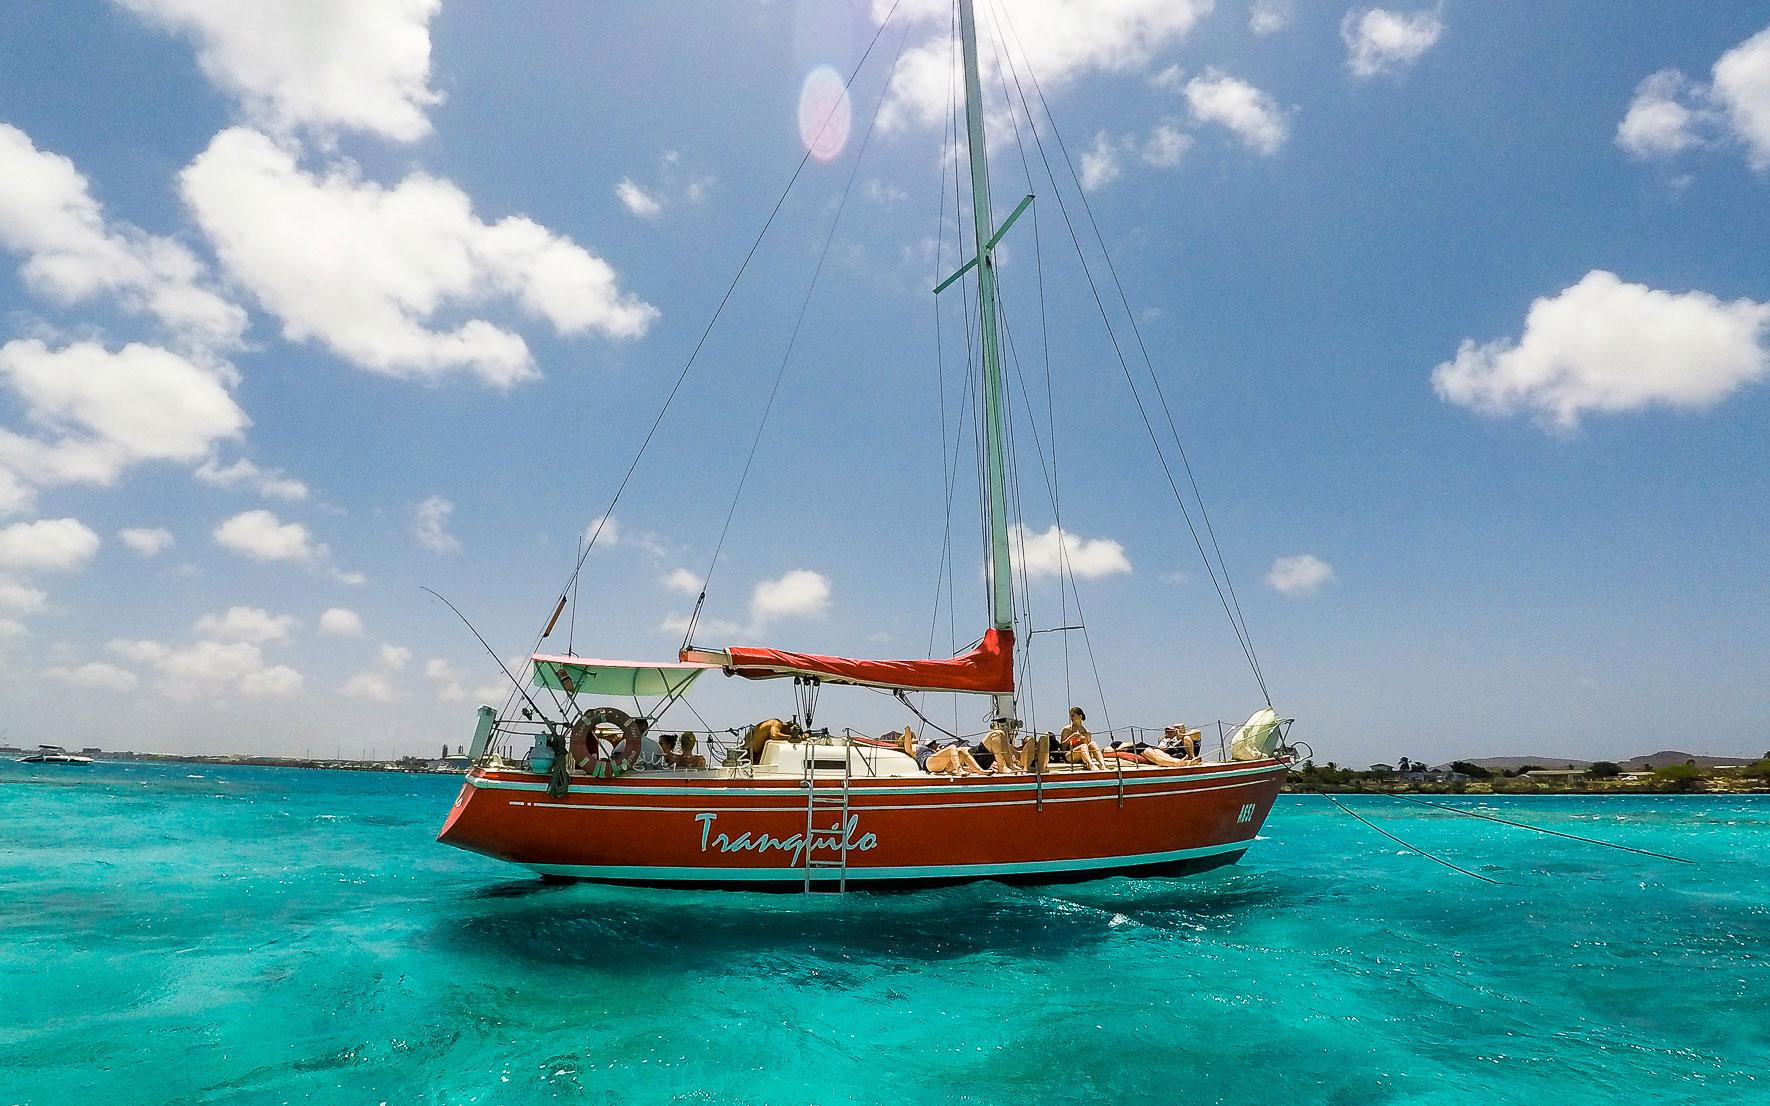 Tranquilo Charters Aruba